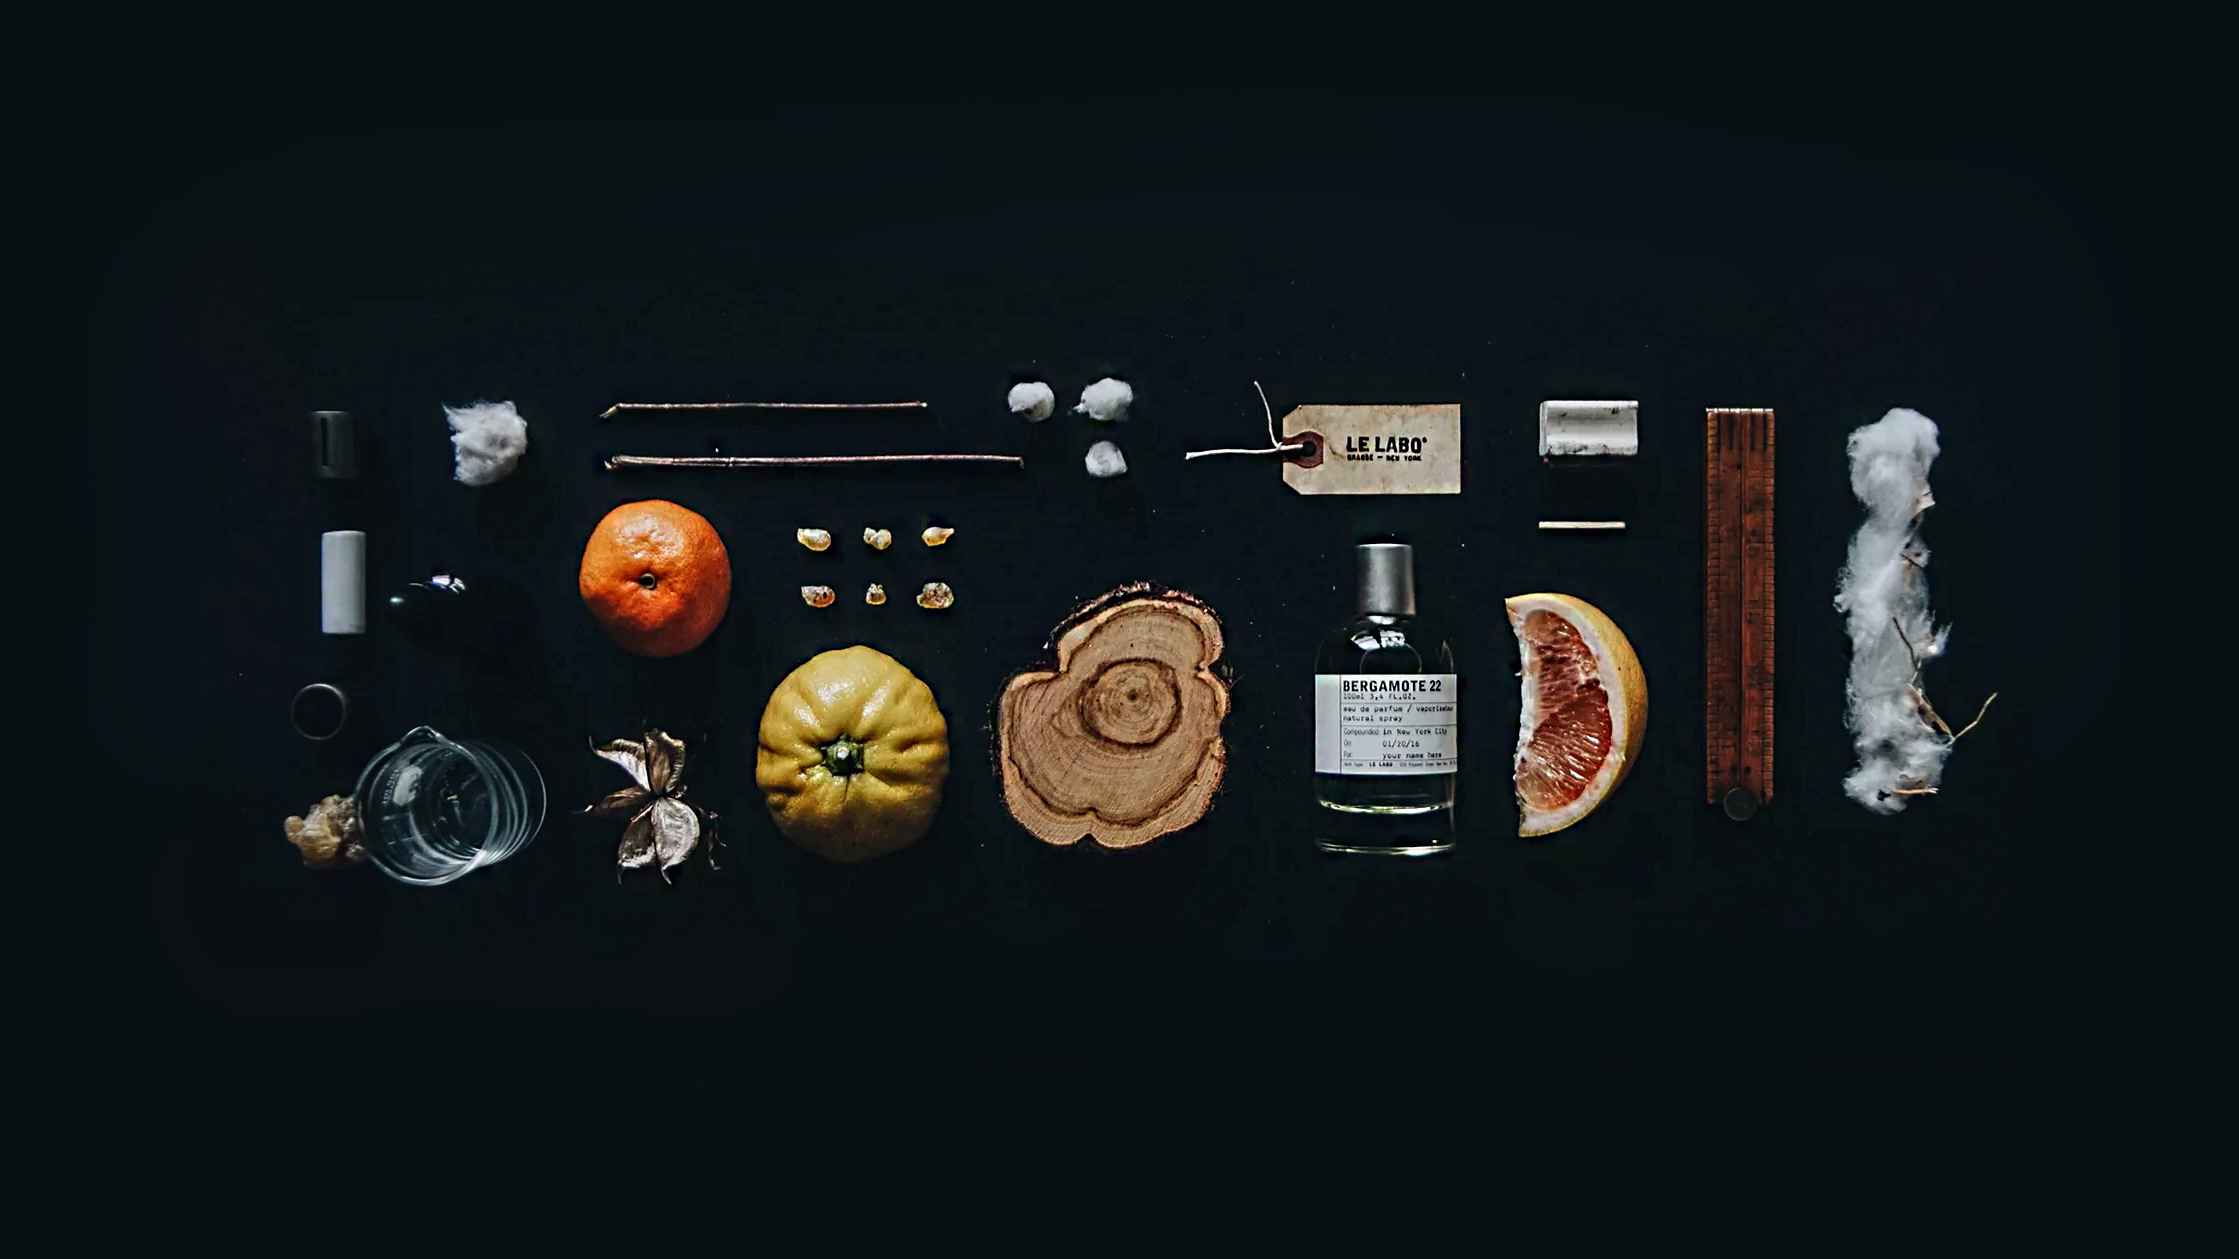 Best men's fragrances and colognes 2019: long lasting scent